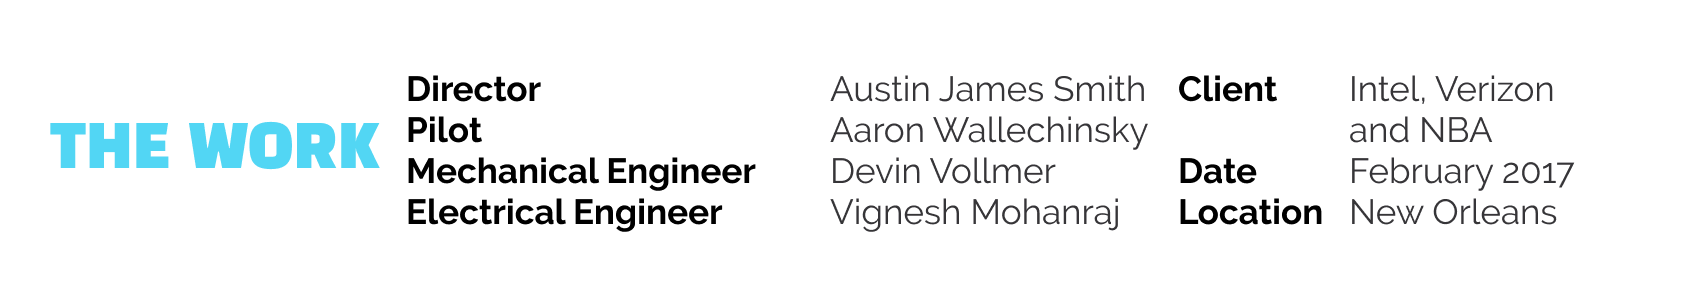 LAD creators Dunk Drone 2017